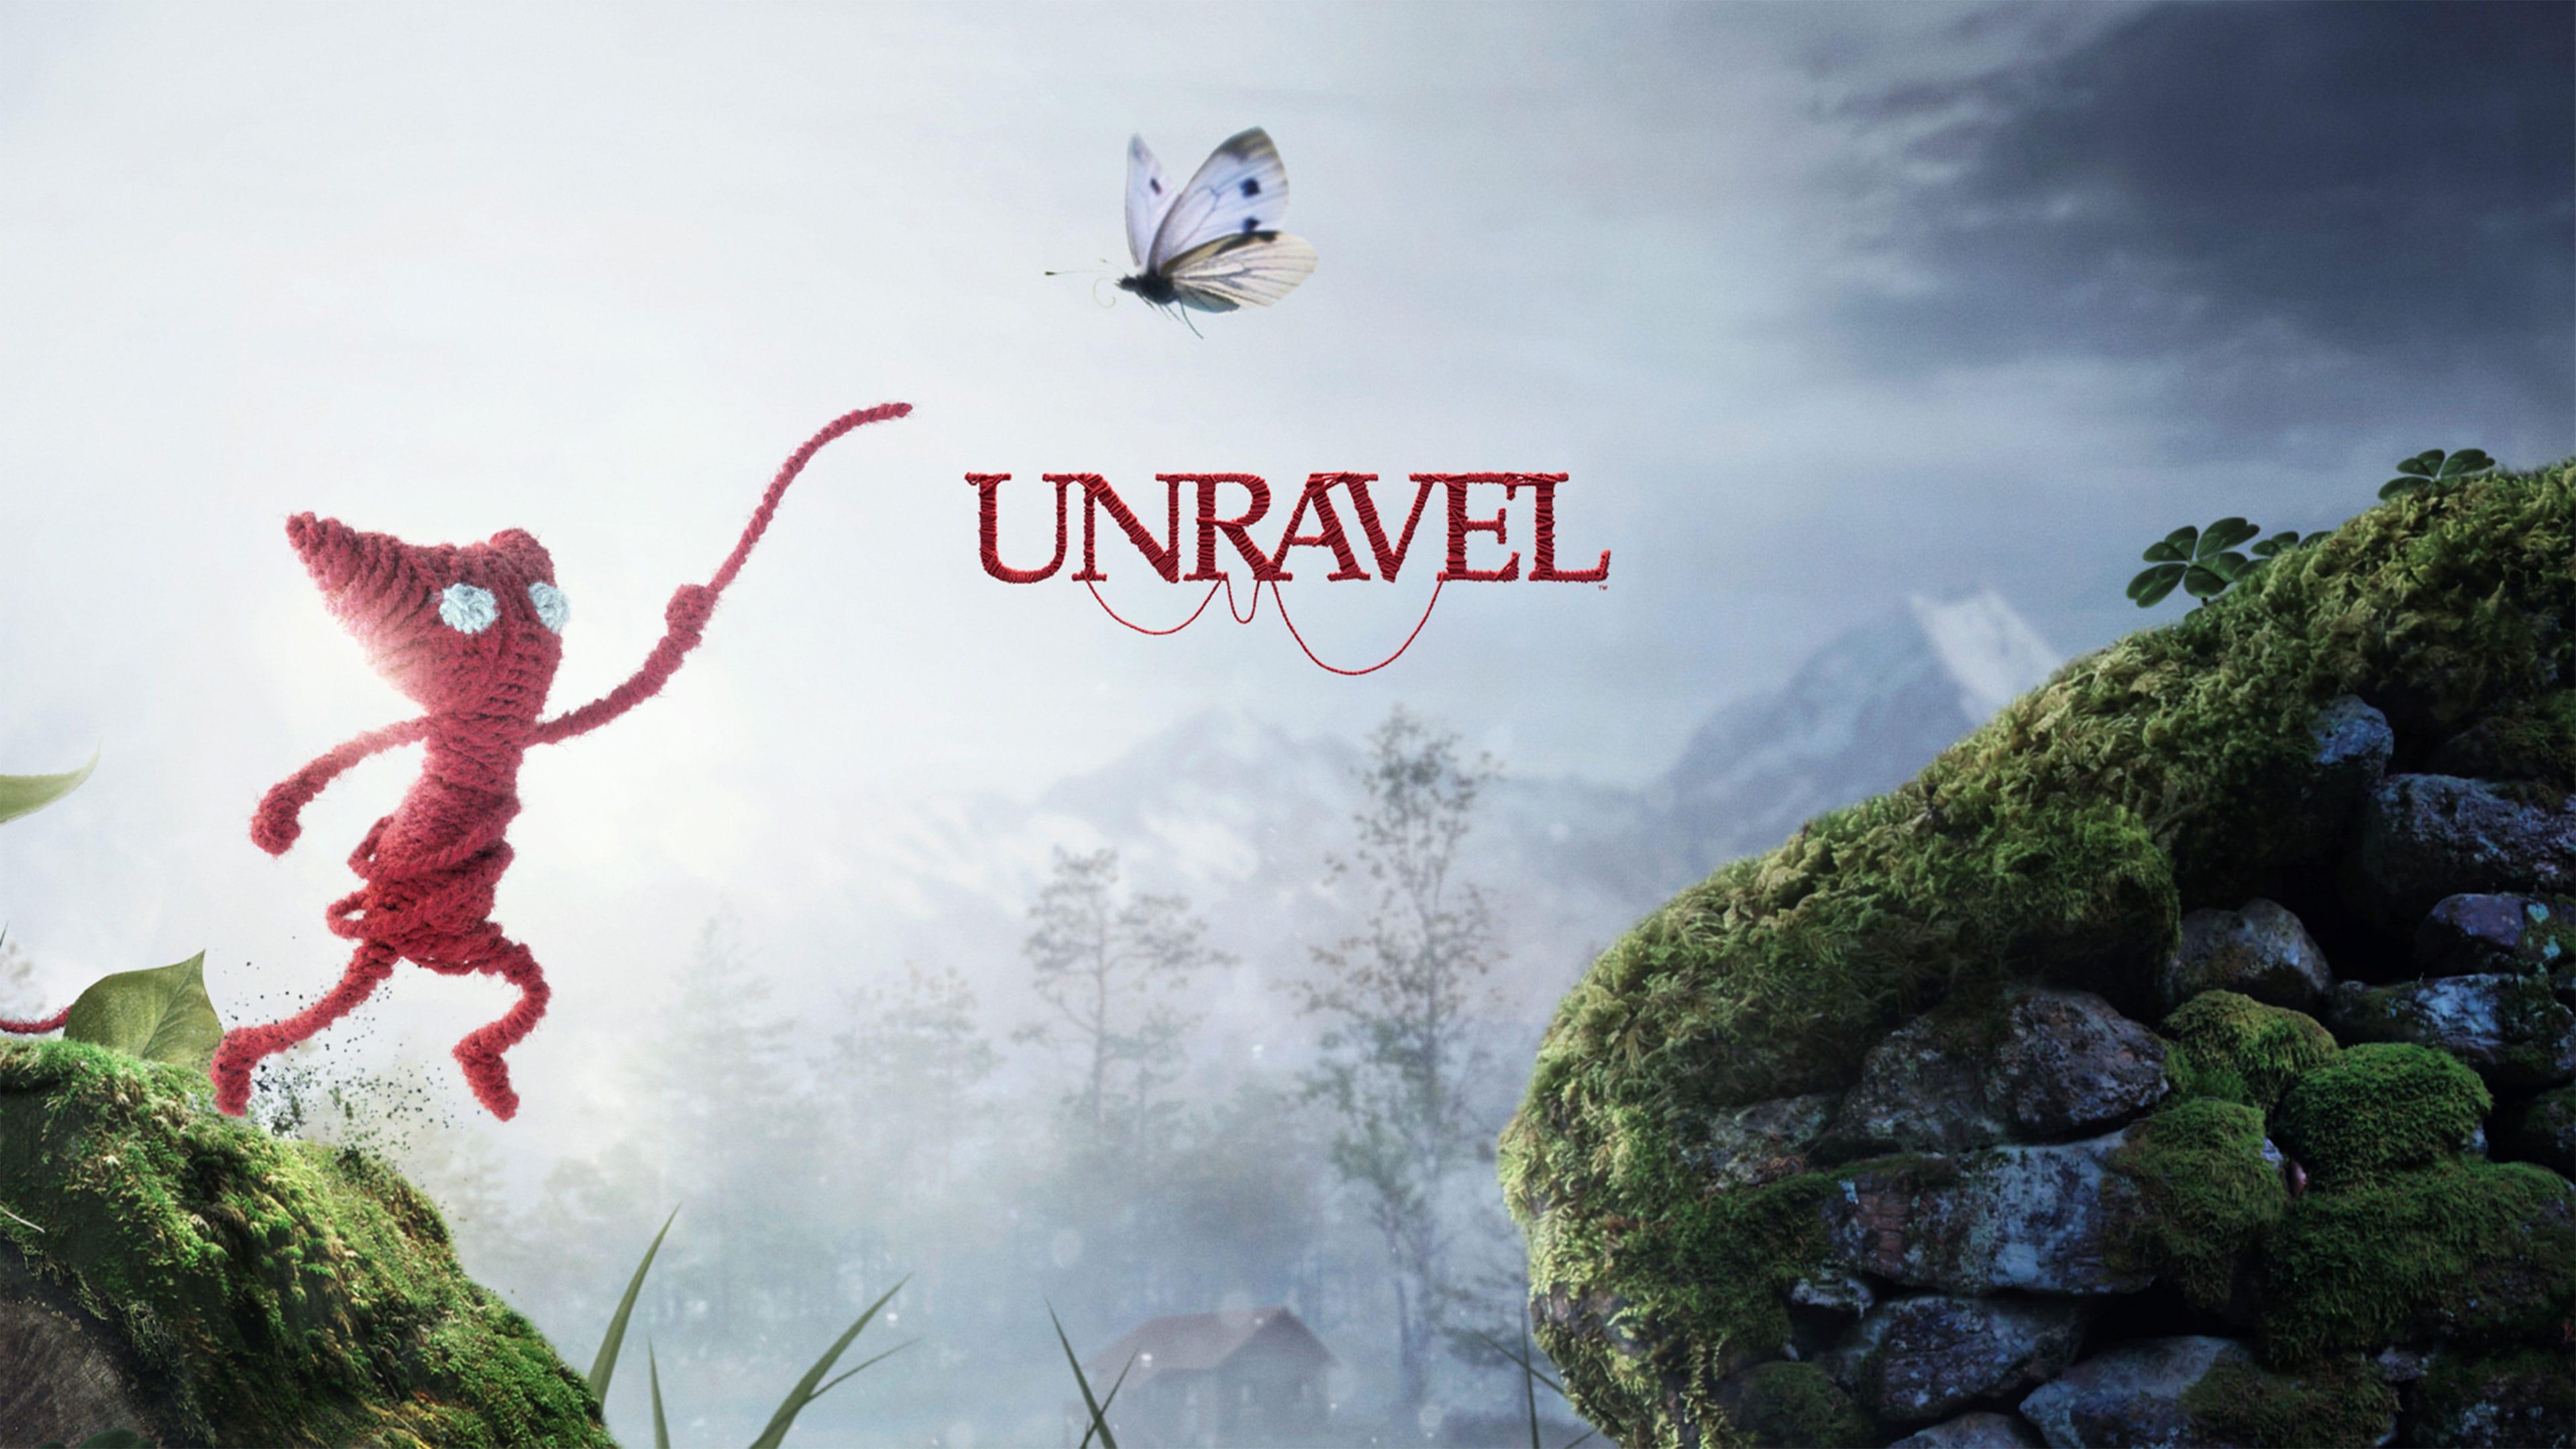 Unravel Wallpaper